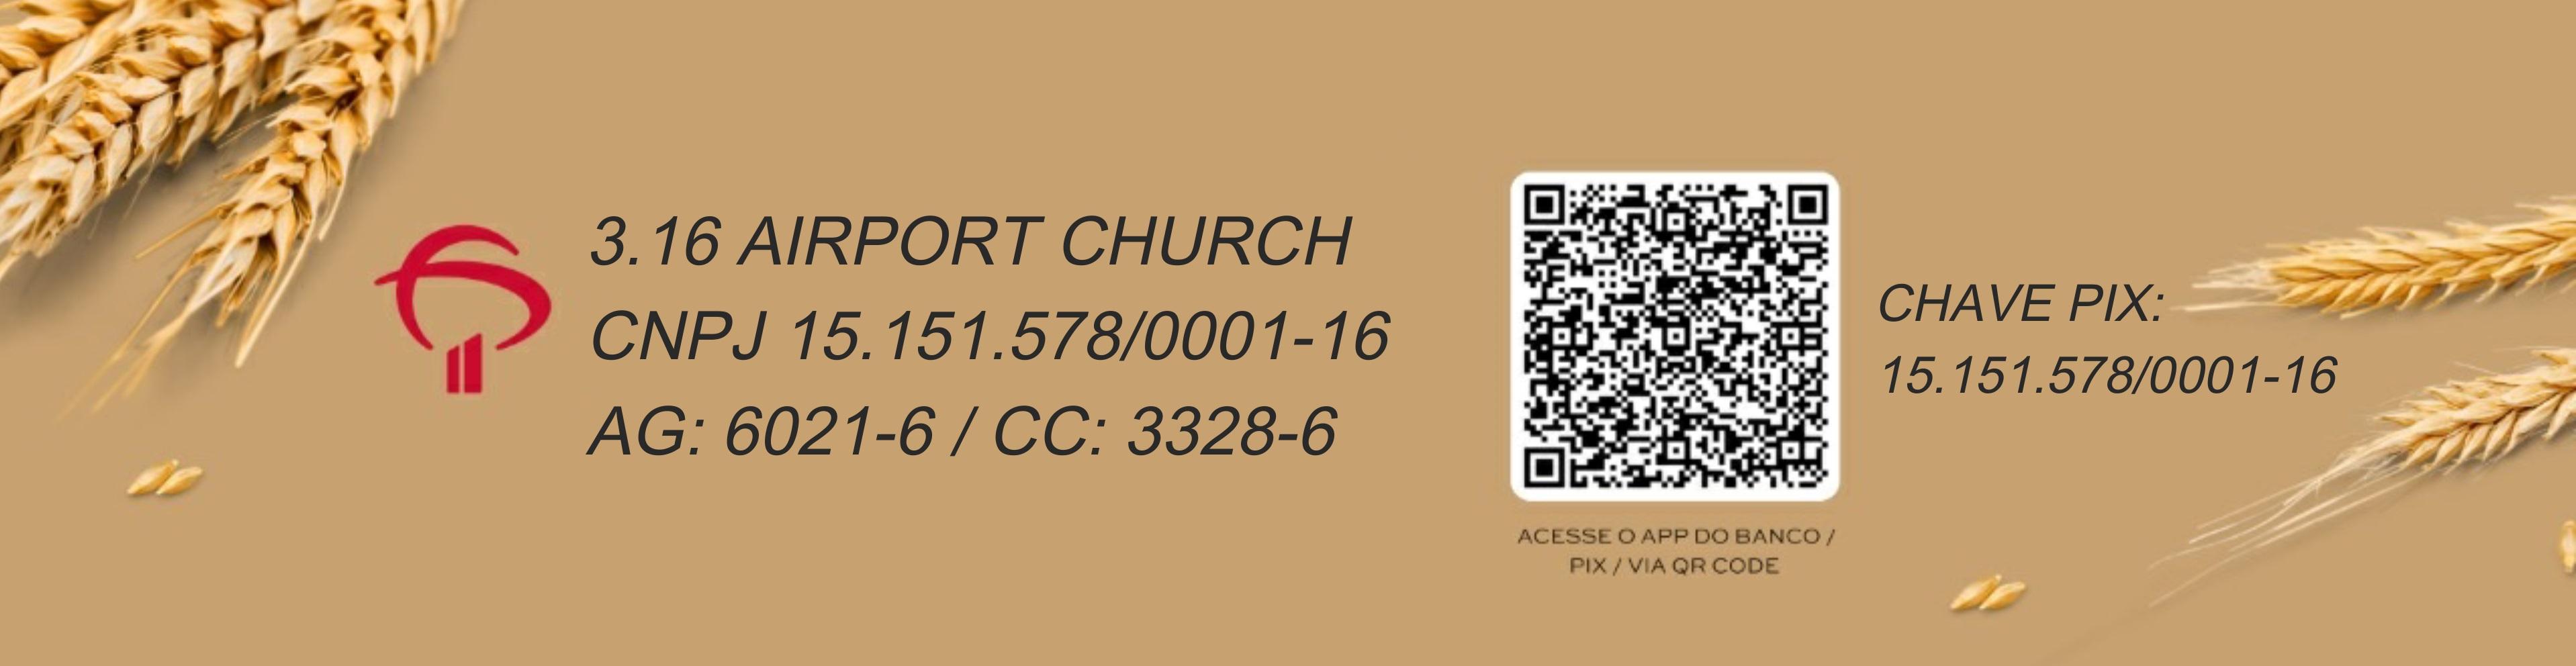 semeando-no-reino-dizimos-e-ofertas-316-airport-church-oficial